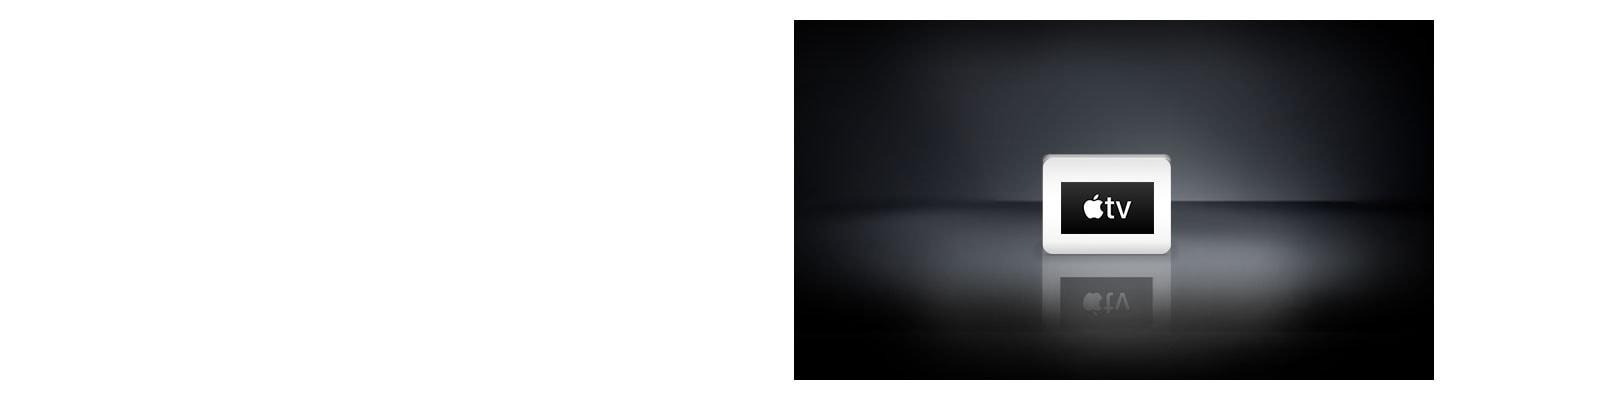 Logo Apple TV tersusun secara horizontal dengan latar belakang hitam.